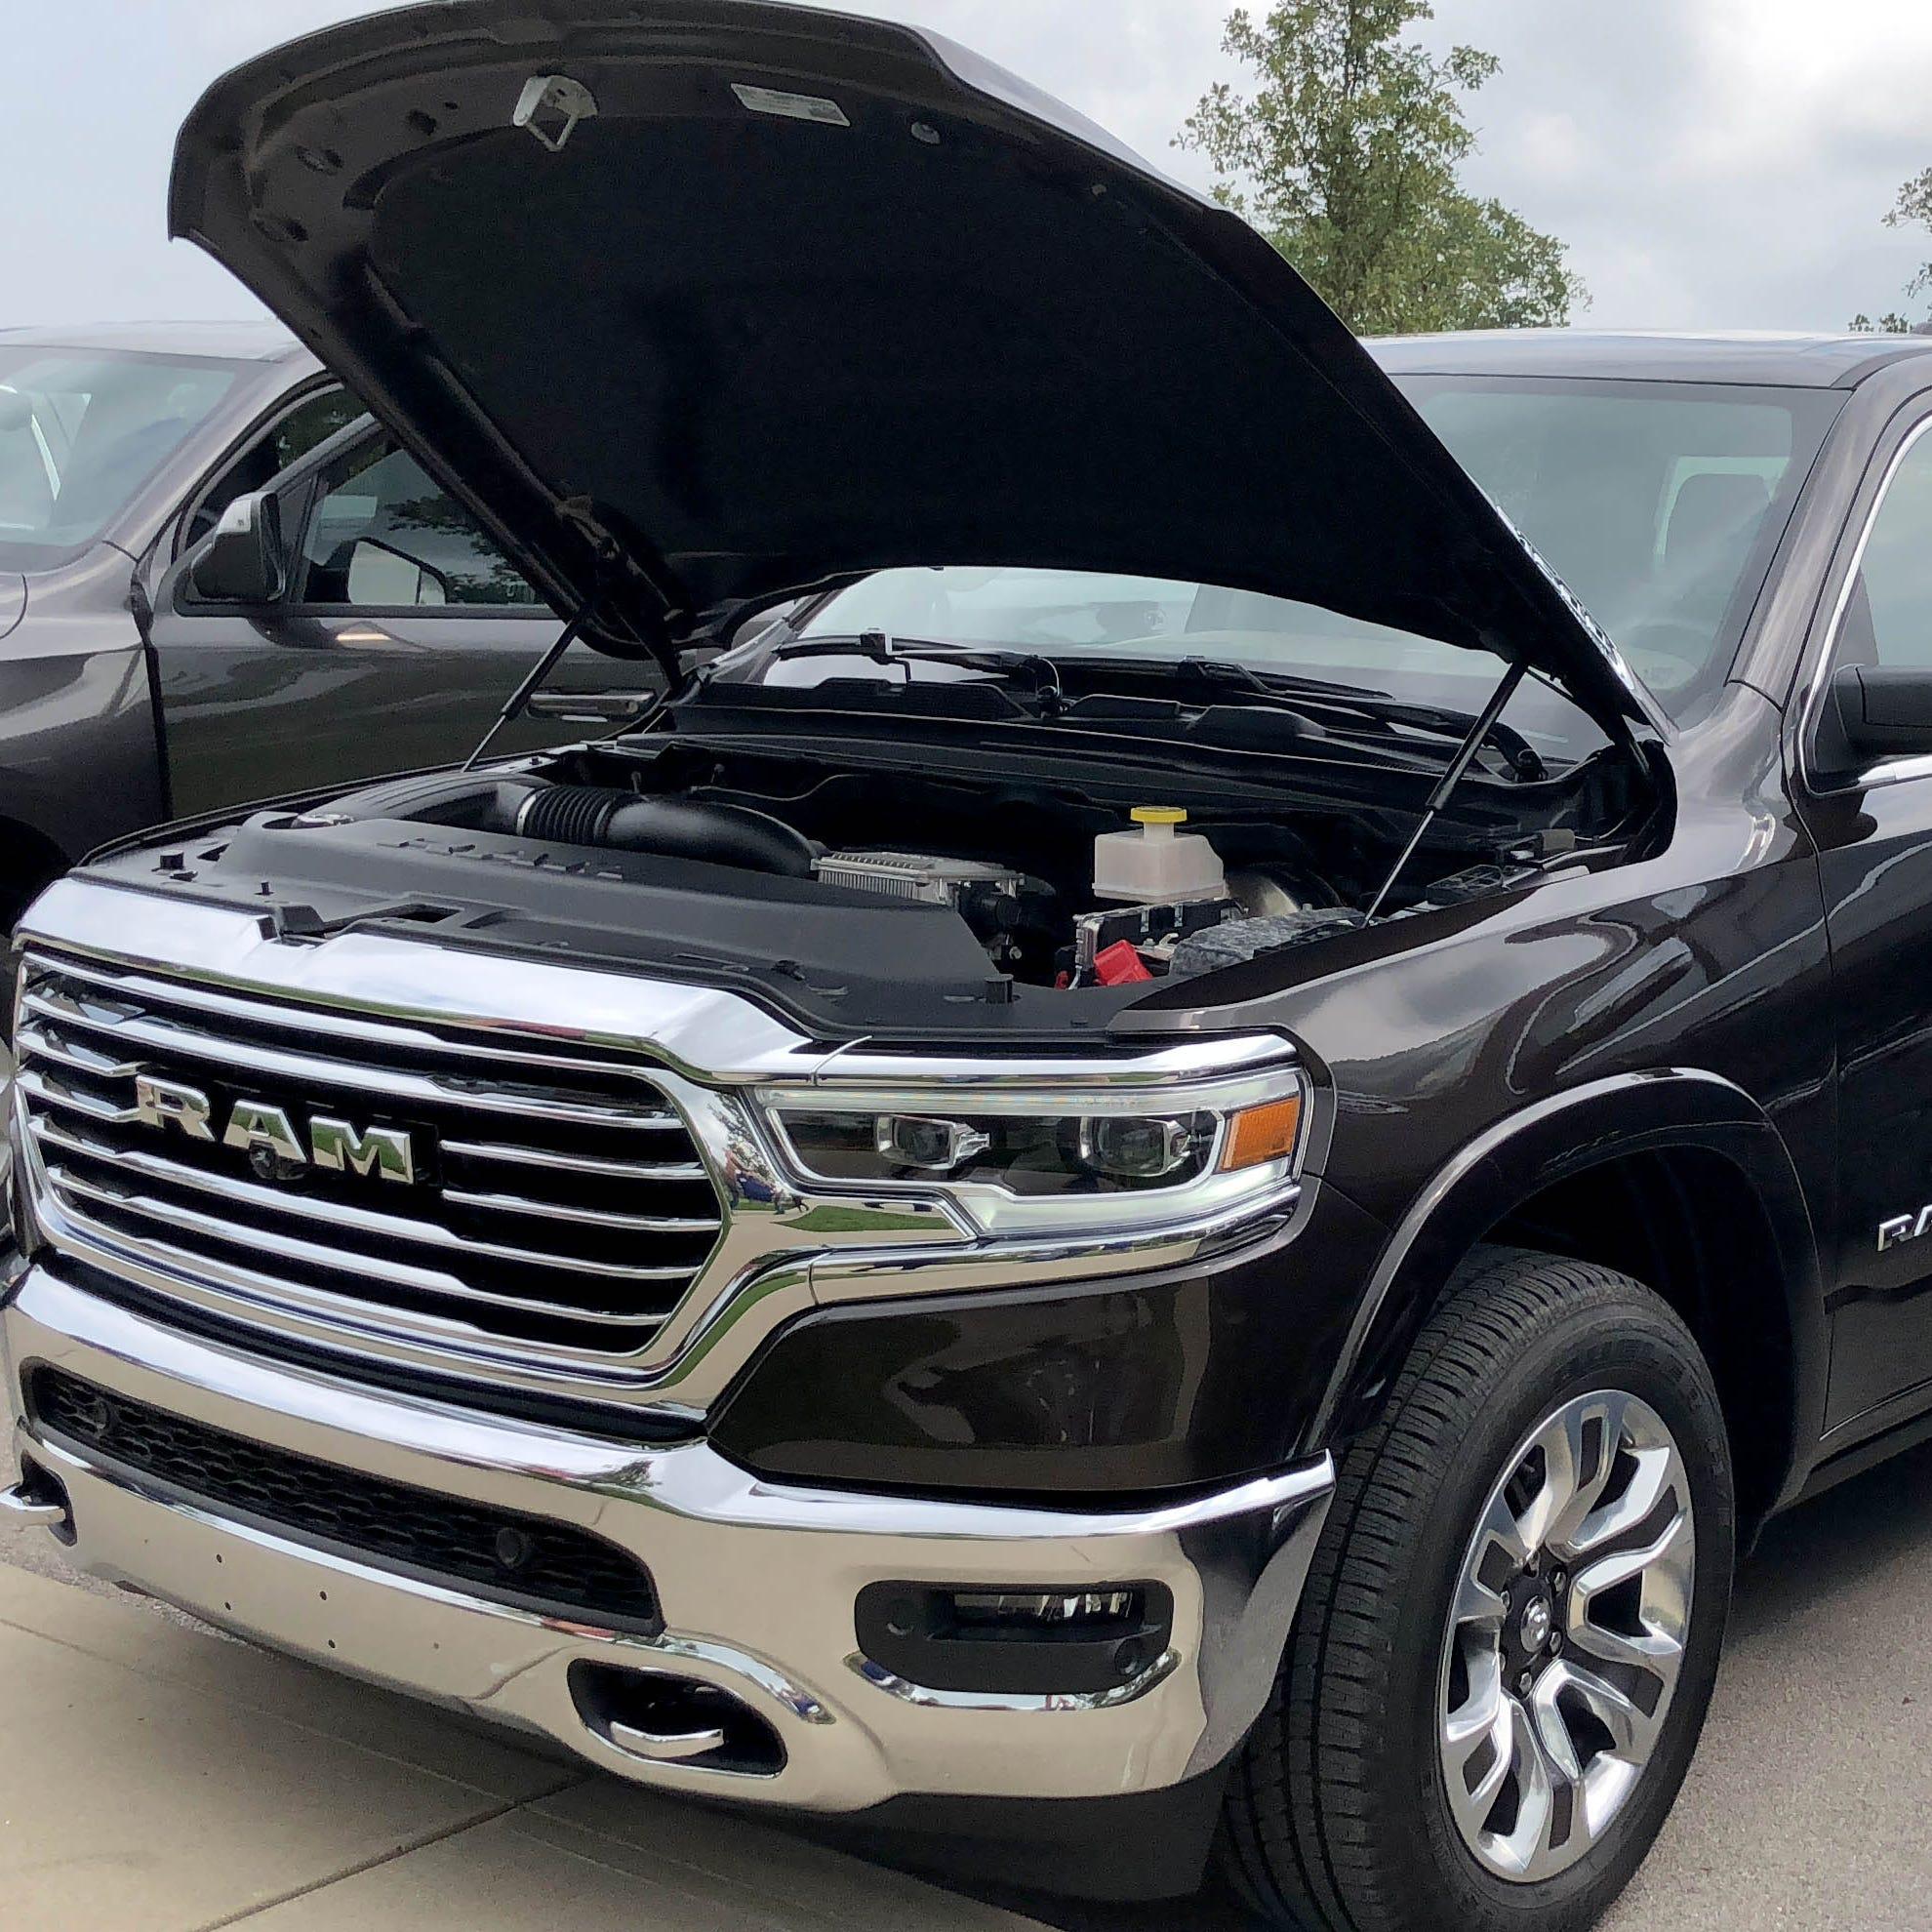 First drive: 2019 Ram 1500 eTorque mild-hybrid changes pickups for good